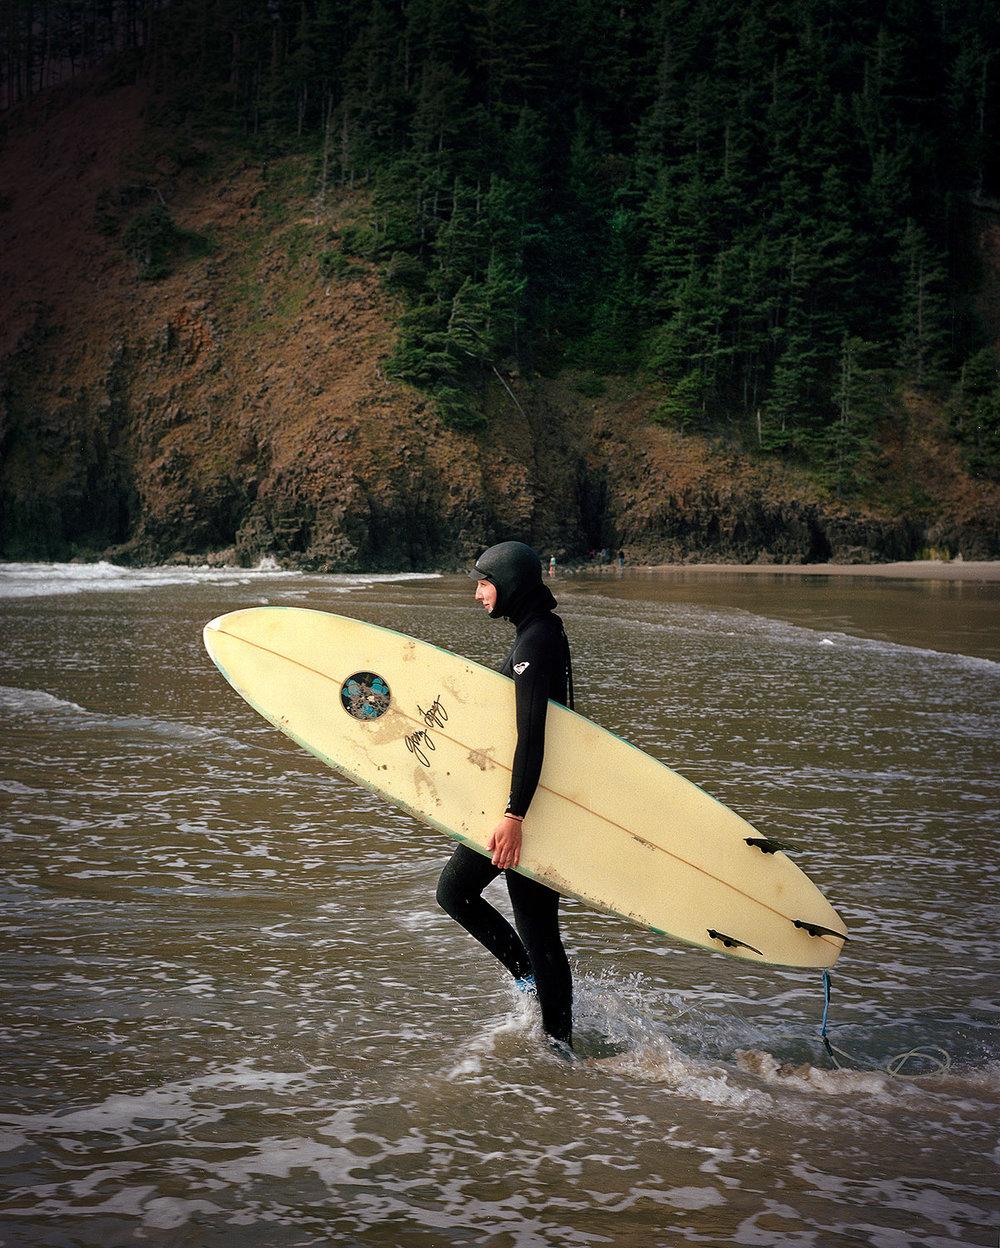 surfing6_edit.jpg